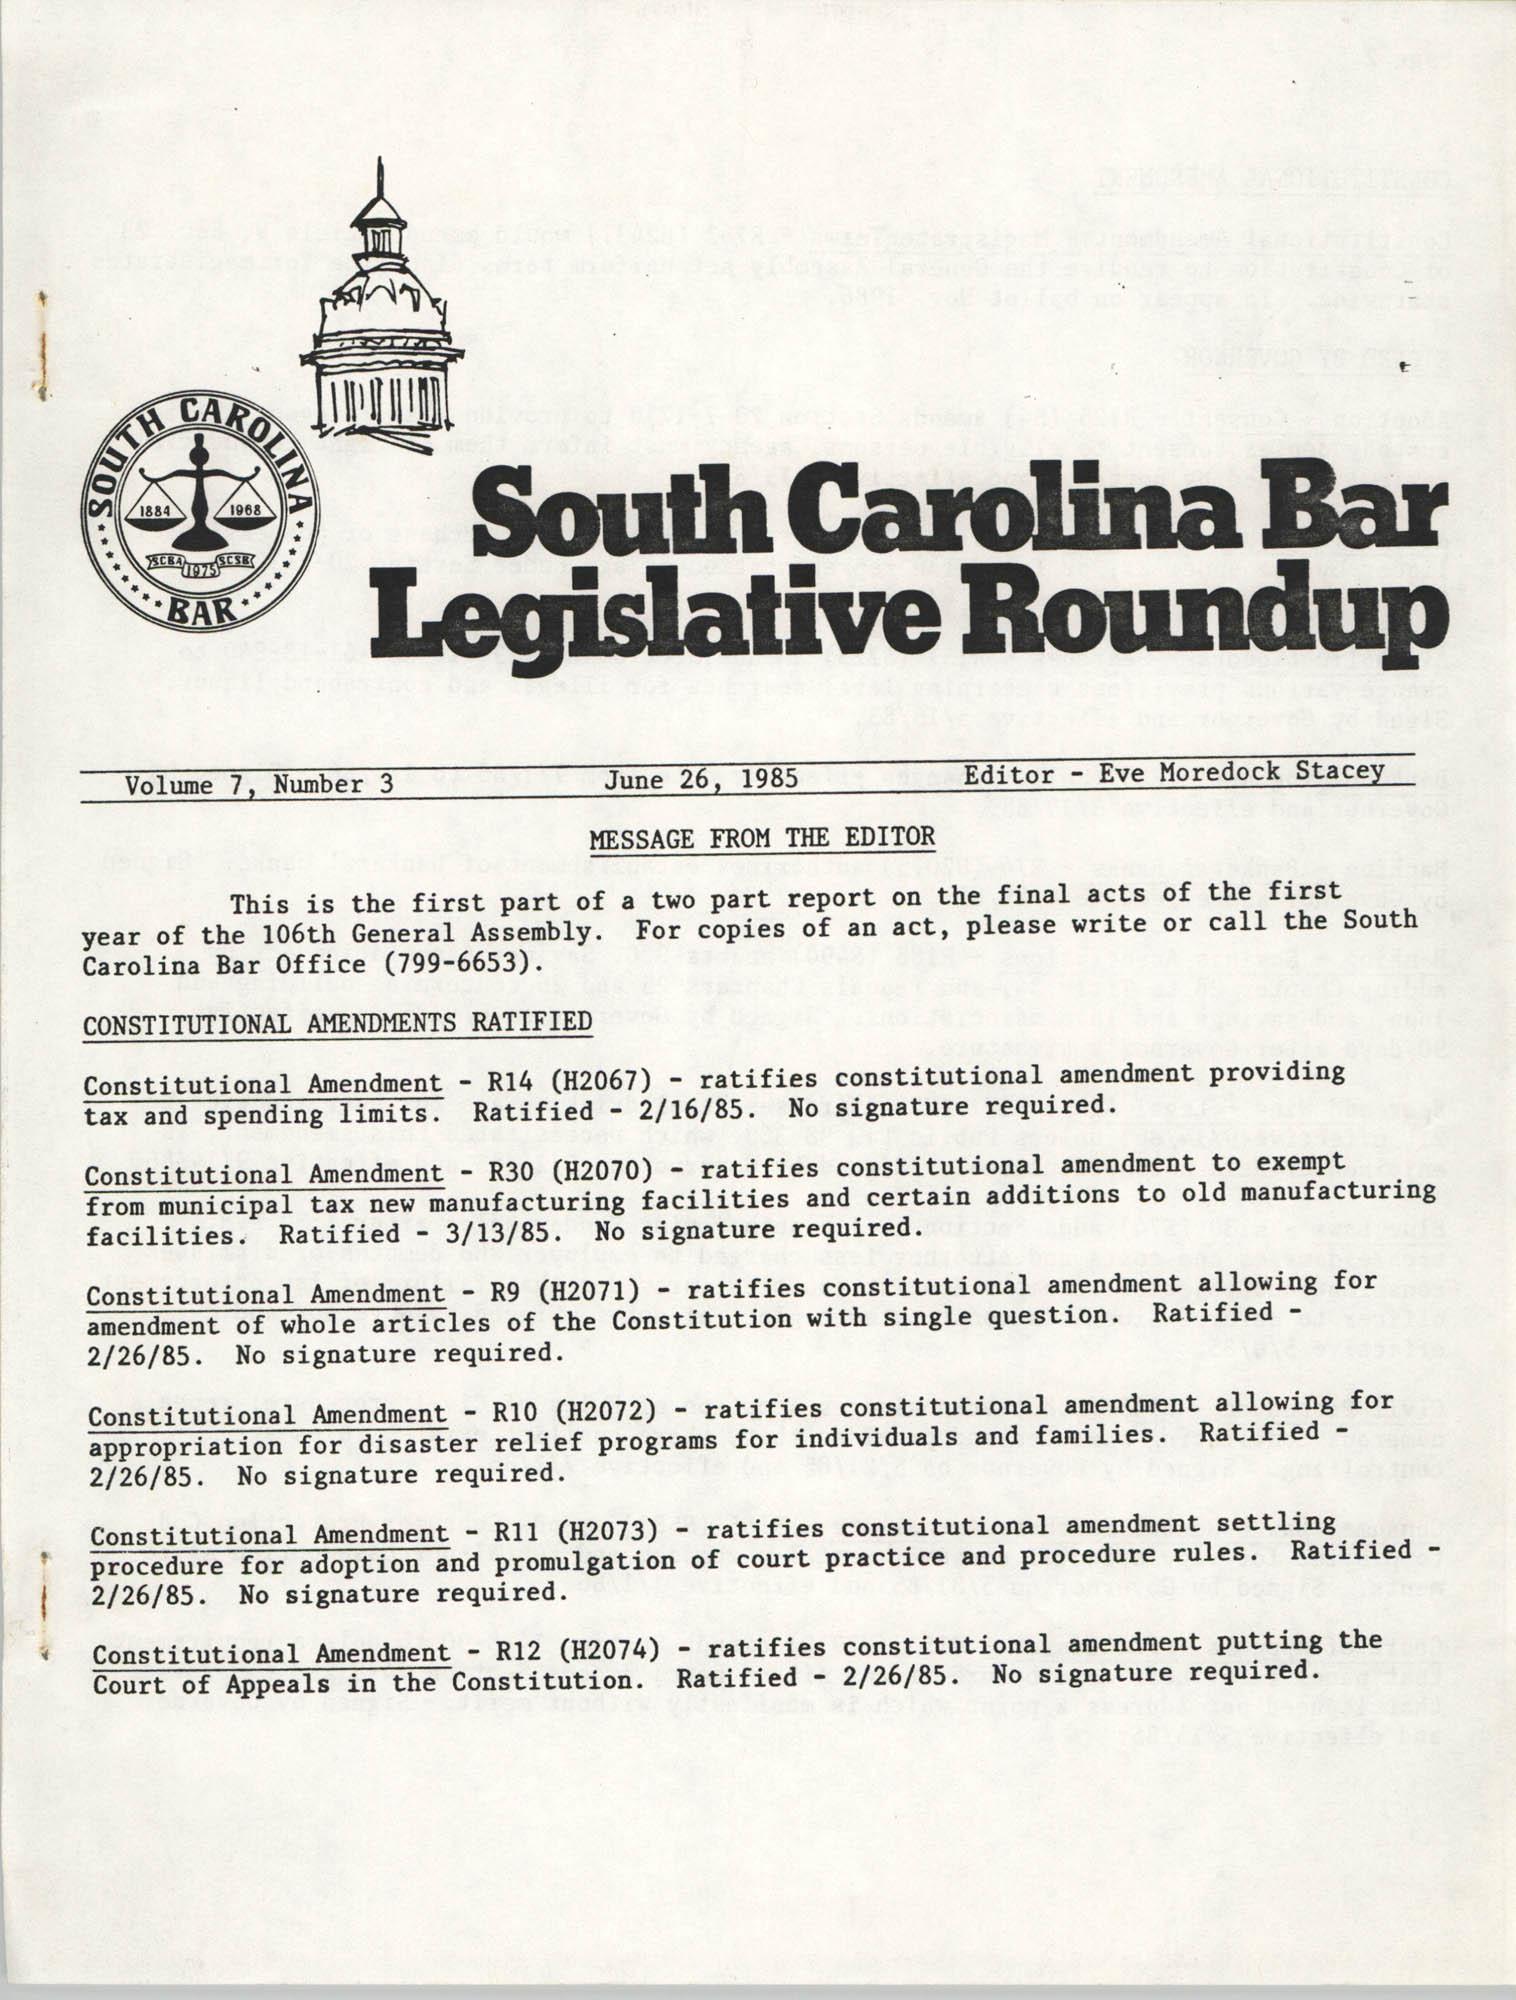 South Carolina Bar Legislative Roundup, Vol. 7 No. 3, June 26, 1985